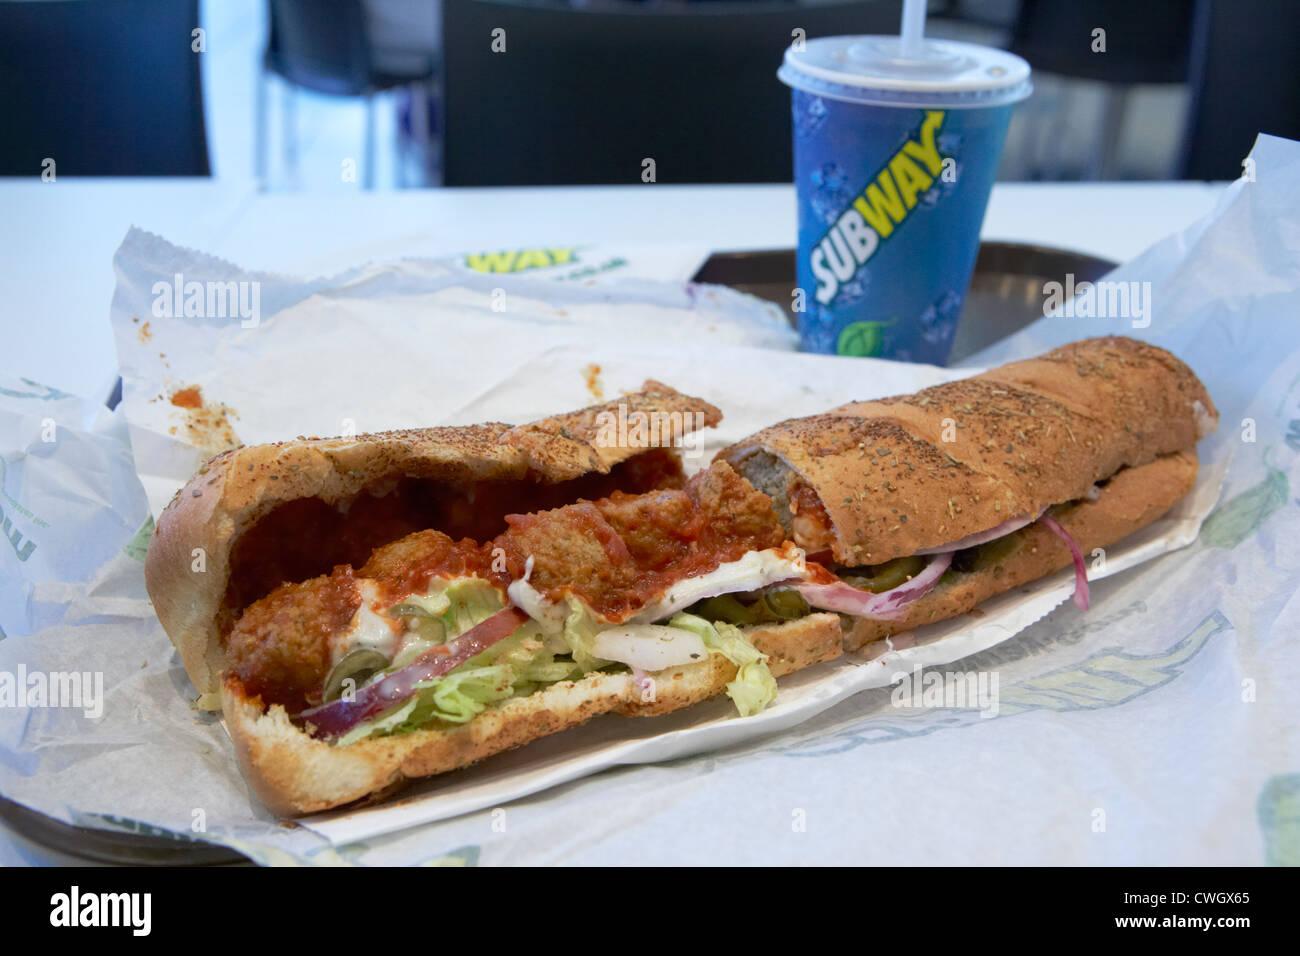 Subway Sandwich Stock Photos Subway Sandwich Stock Images Alamy